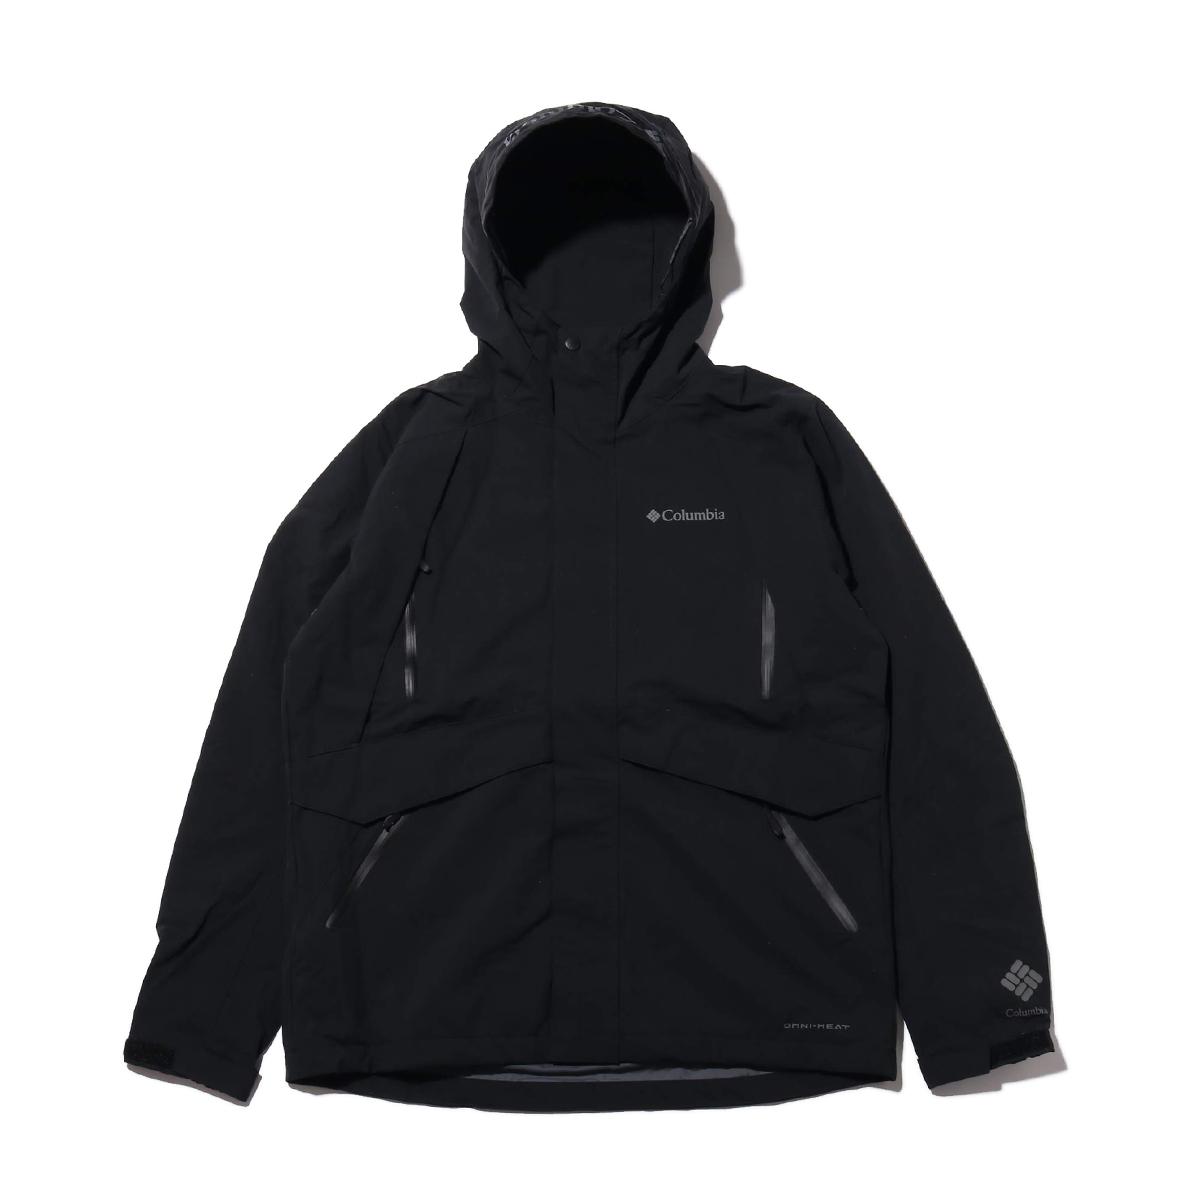 Columbia Keel Spire™ Jacket(Black)(コロンビア キールスパイアー ジャケット)【メンズ】【ジャケット】【19FA-I】